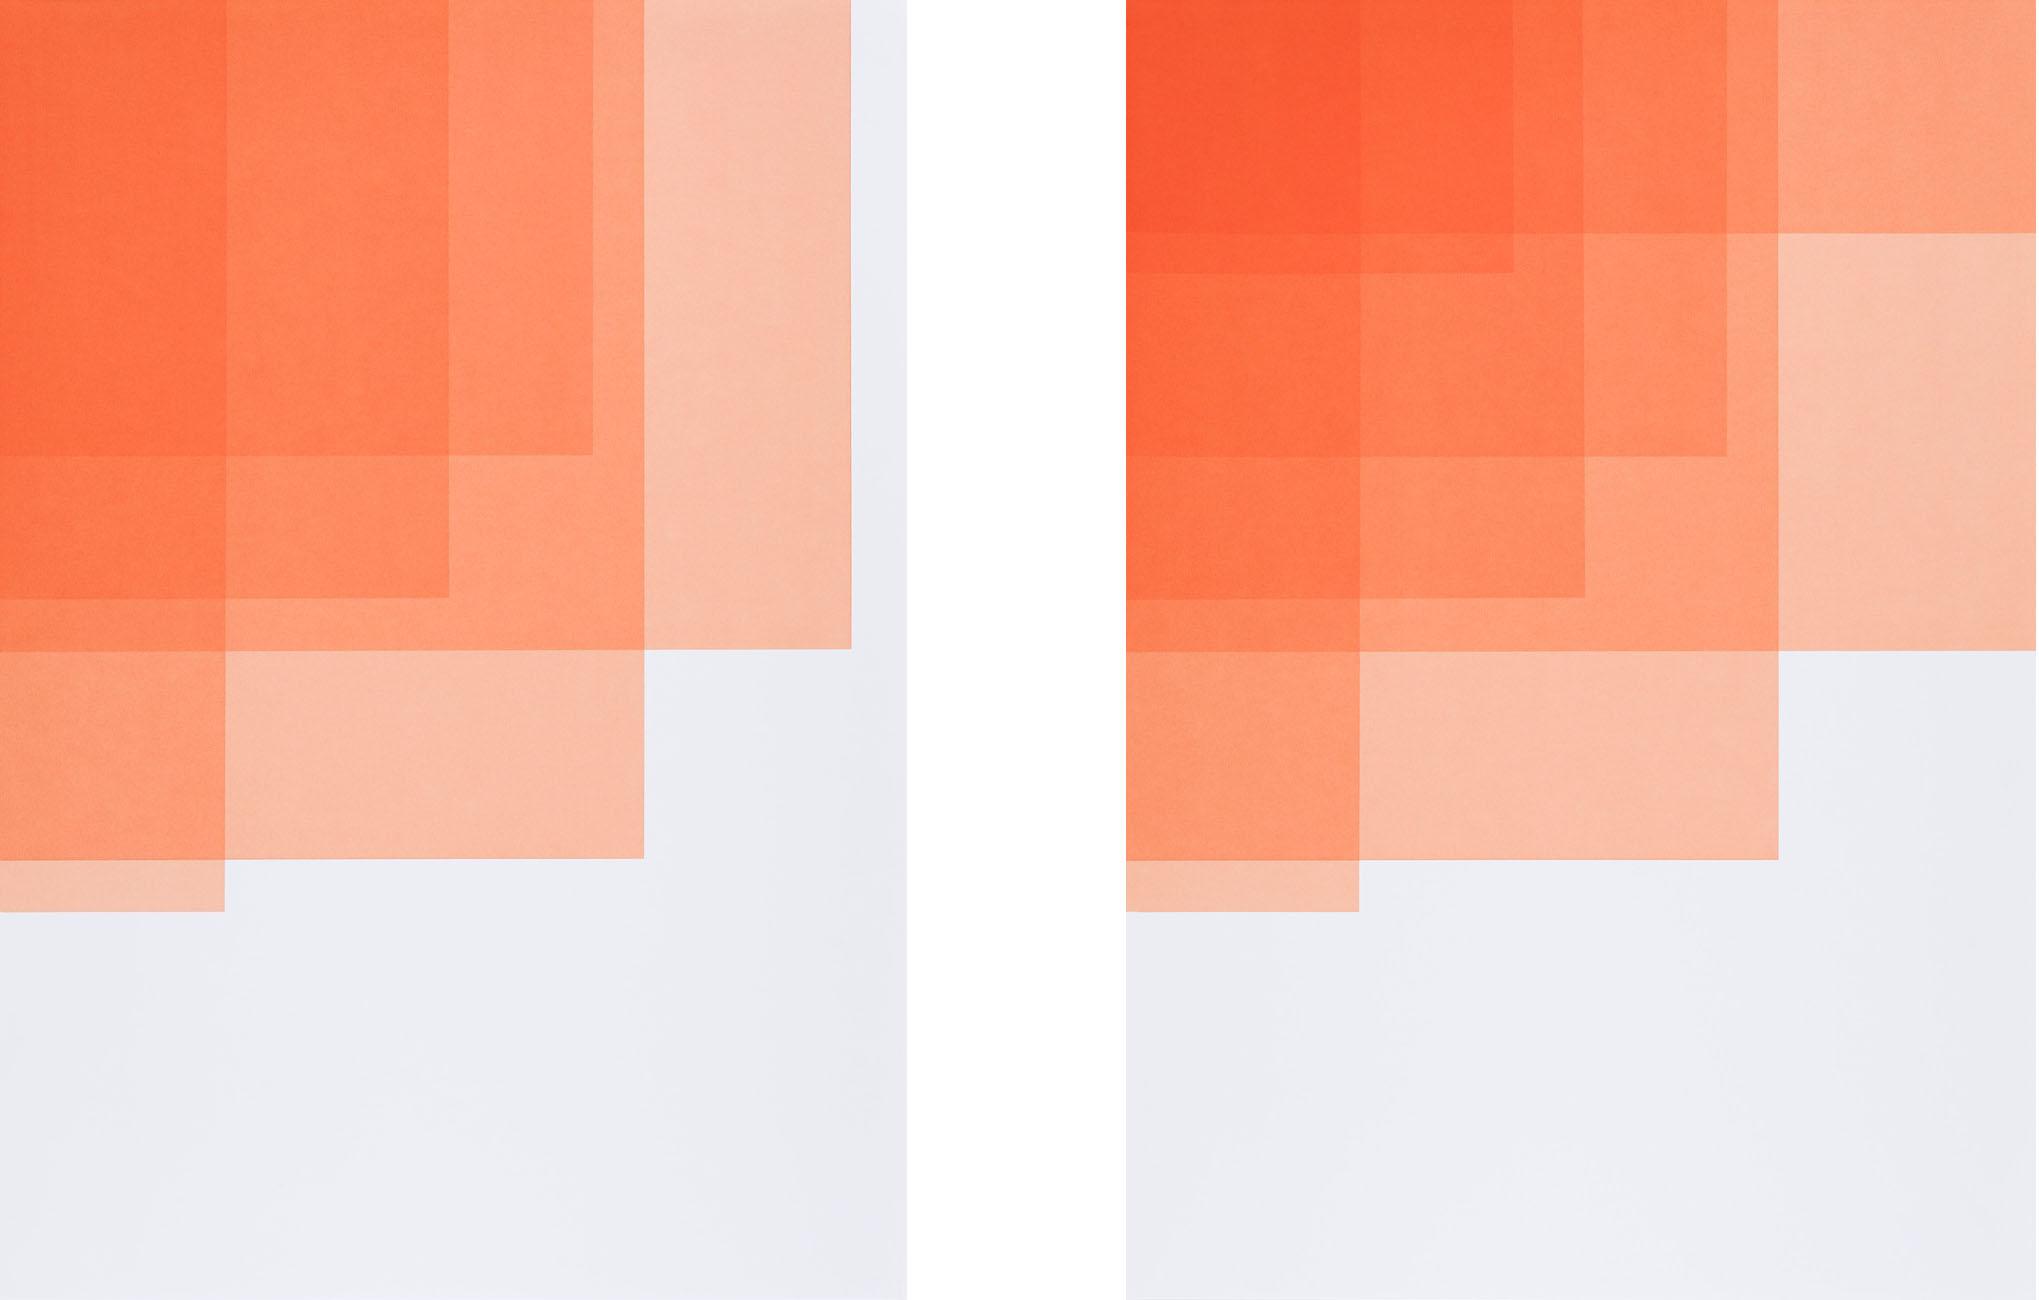 Collecting Colors (Orange I + II), 2016. Silkscreen print 100 x 70 cm. Ed. 4